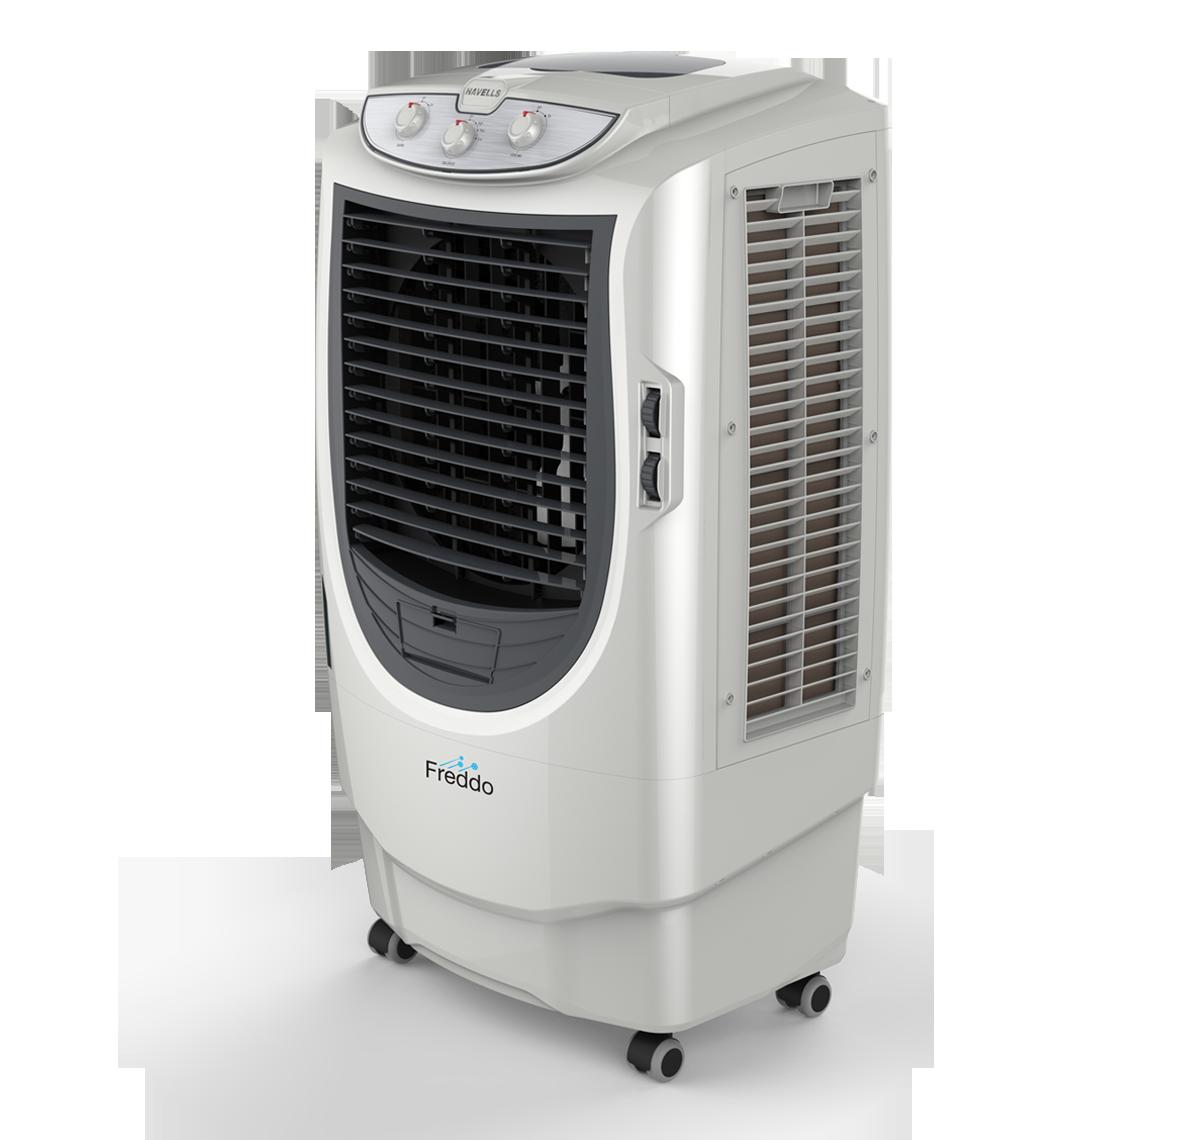 Freddo Desert Air Coolers Online Havells India